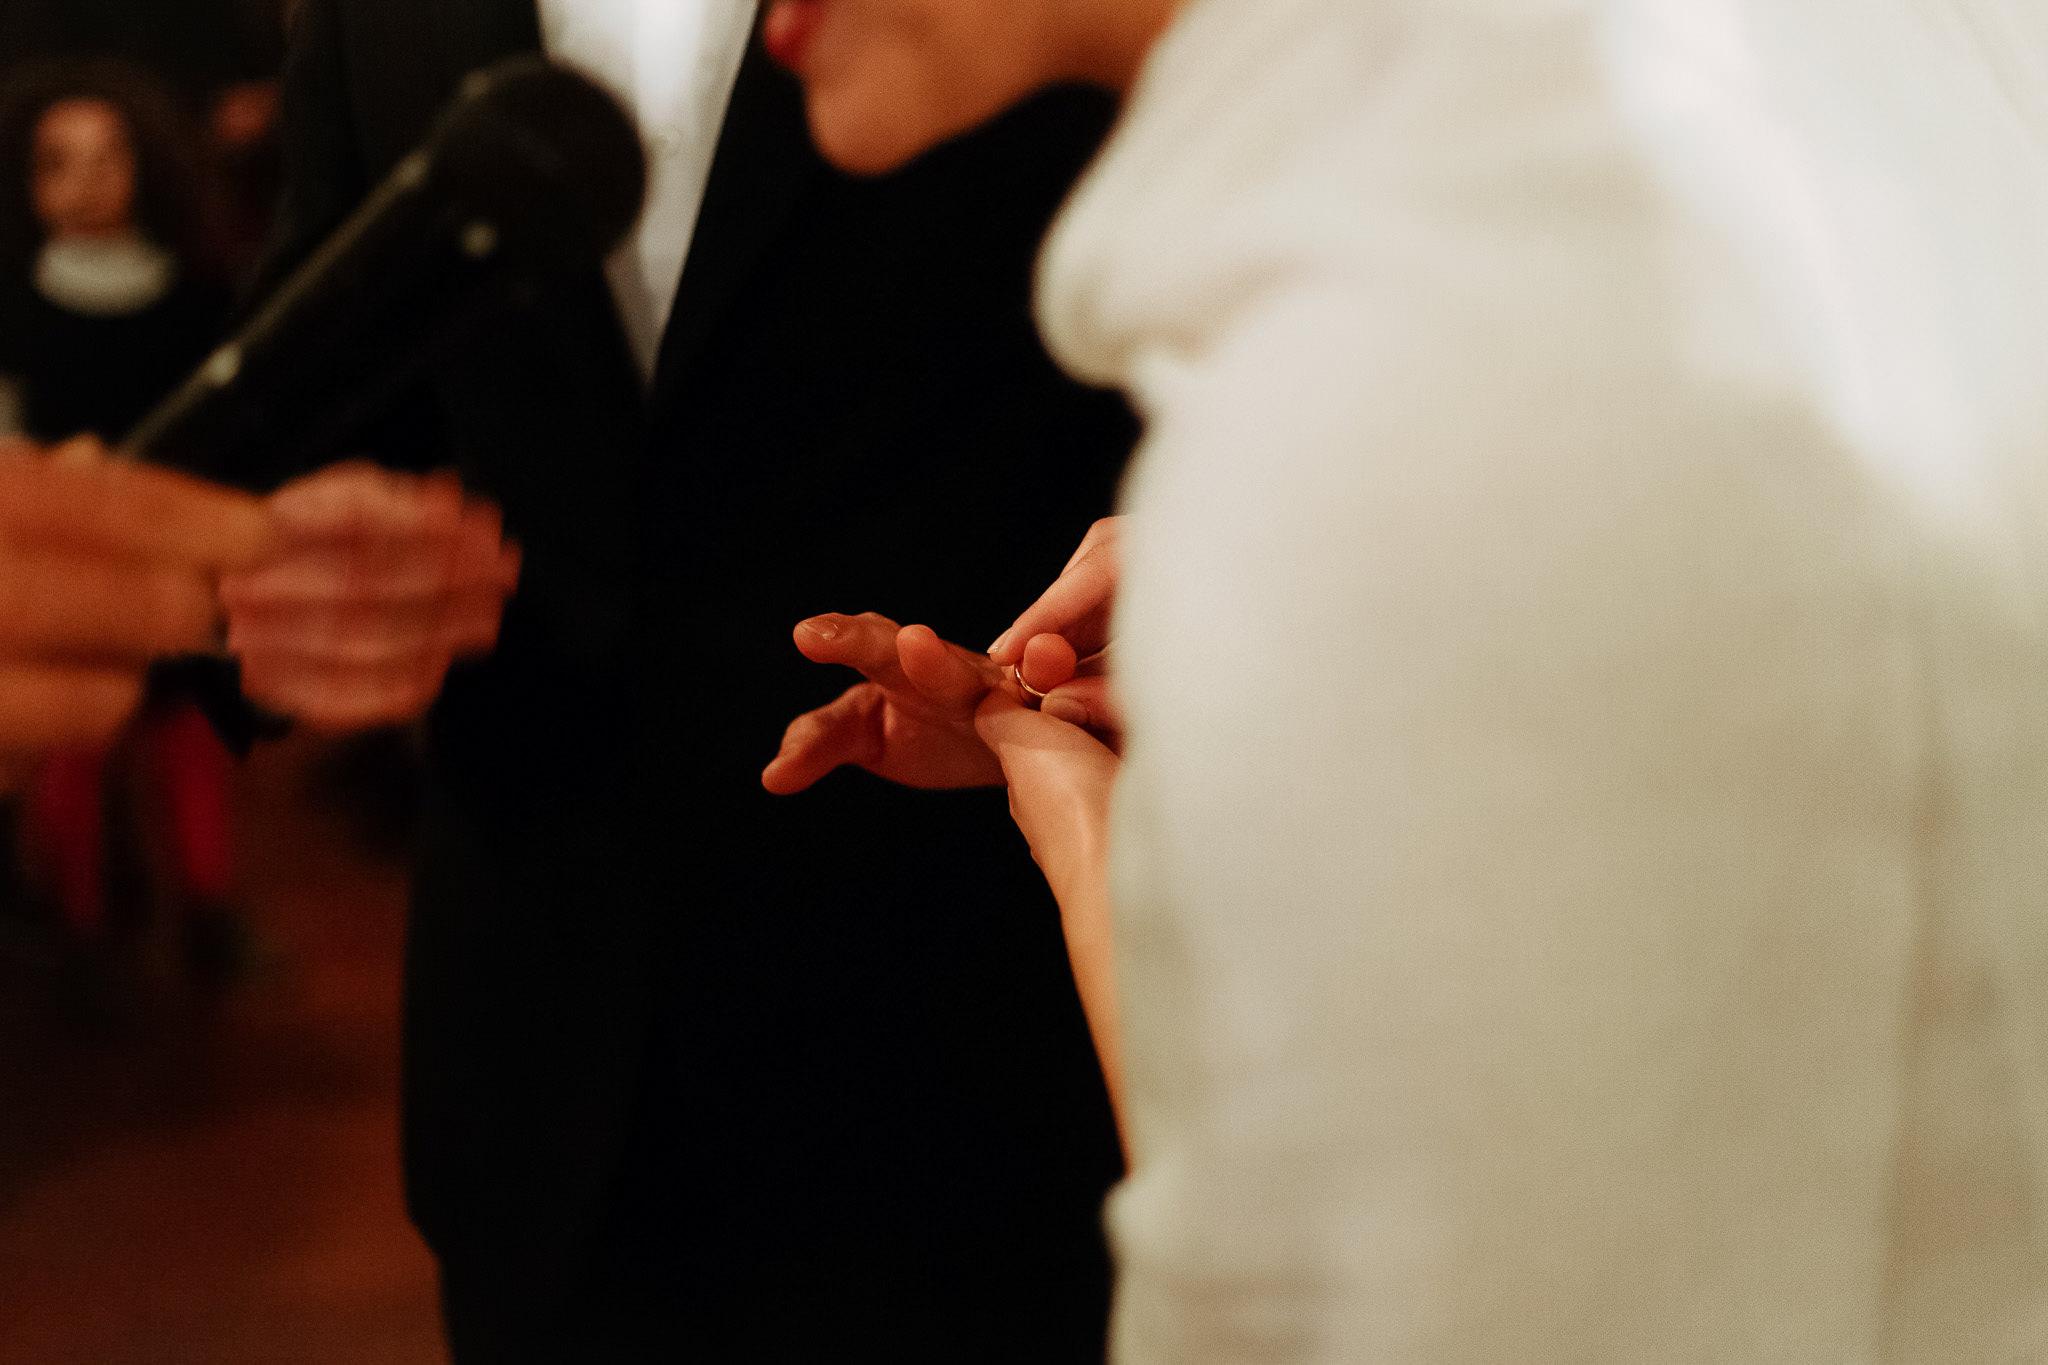 Fotografo matrimonio terni, fotografo terni, wedding photo italy, matrimonio terni, umbria fotografo matrimonio, umbria matrimonio, wedding umbria, destination wedding Umbria, foto terni